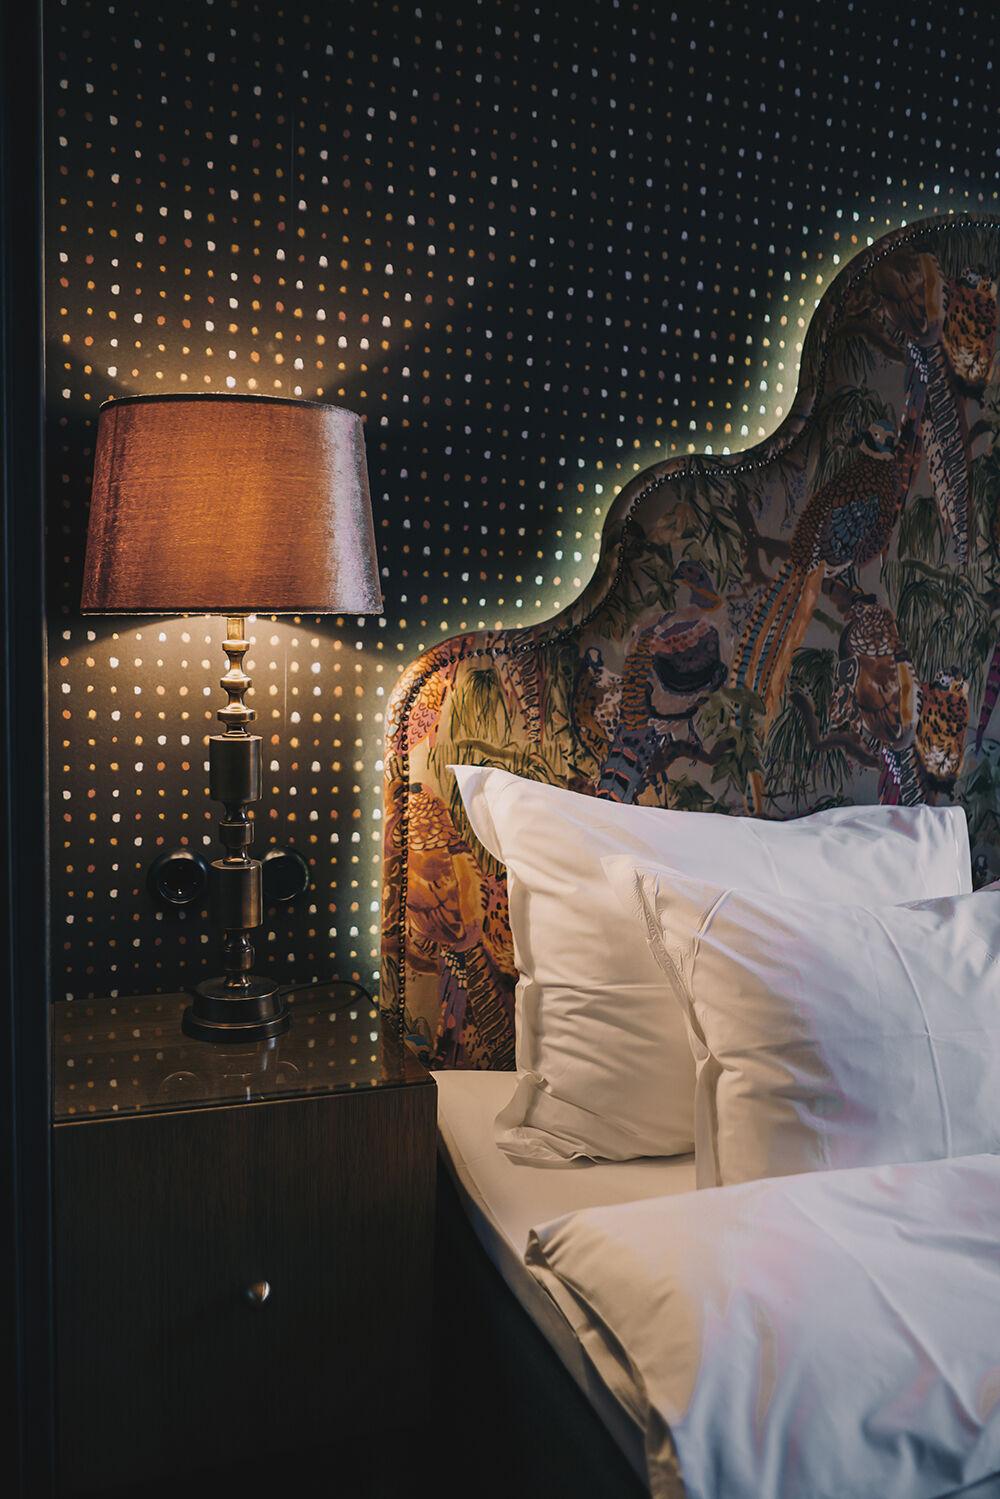 vanja wikström nofo hotel mysigt hotell södermalm stockholm 17